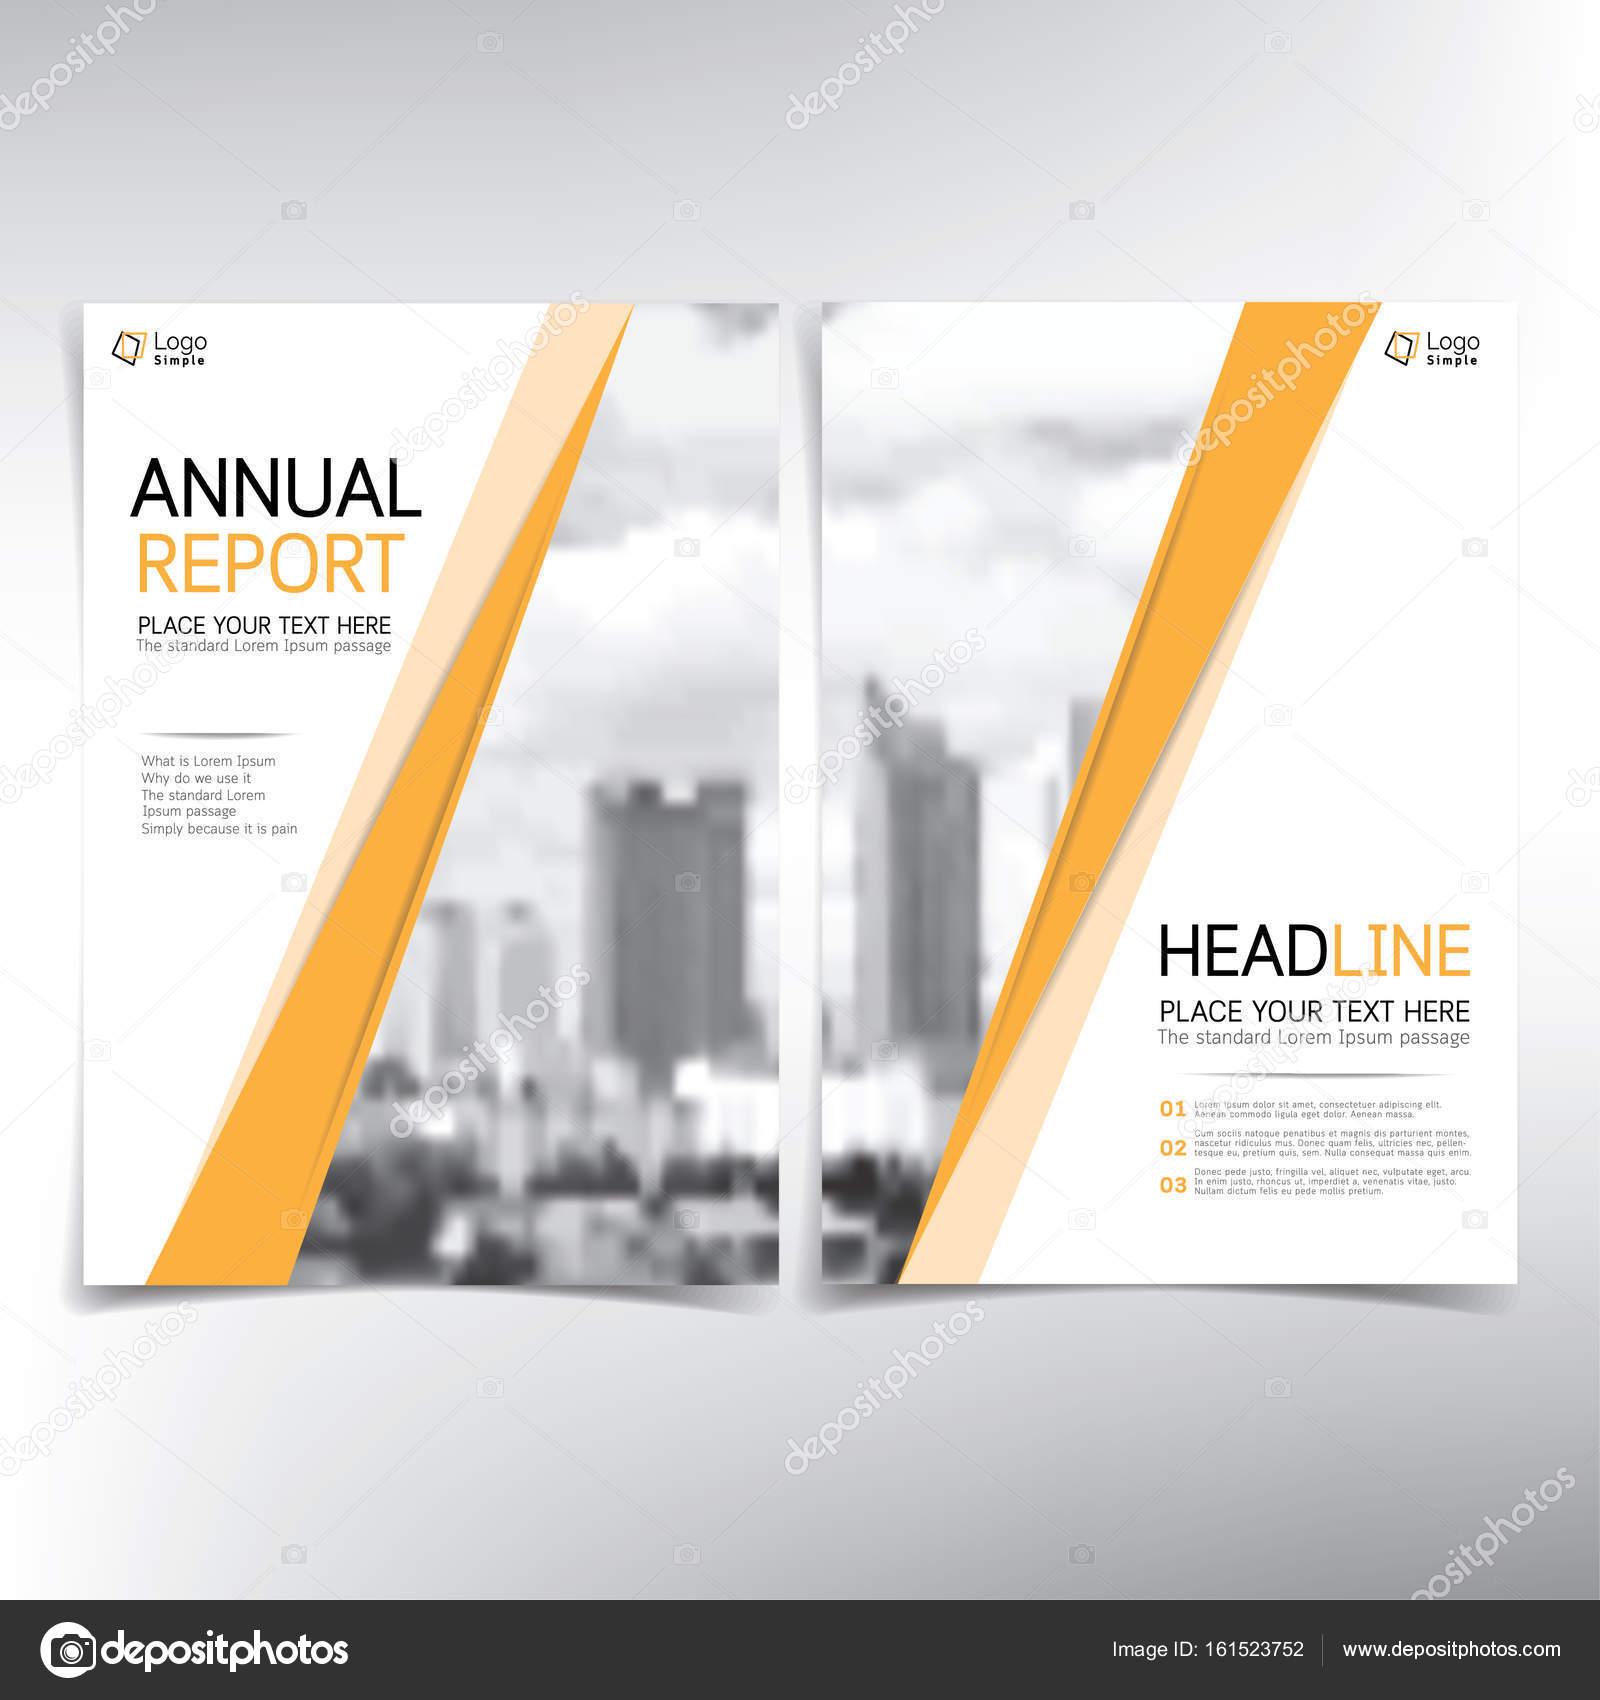 Moderne Business-Deckblatt, Vektor Vorlage, Immobilien concep ...